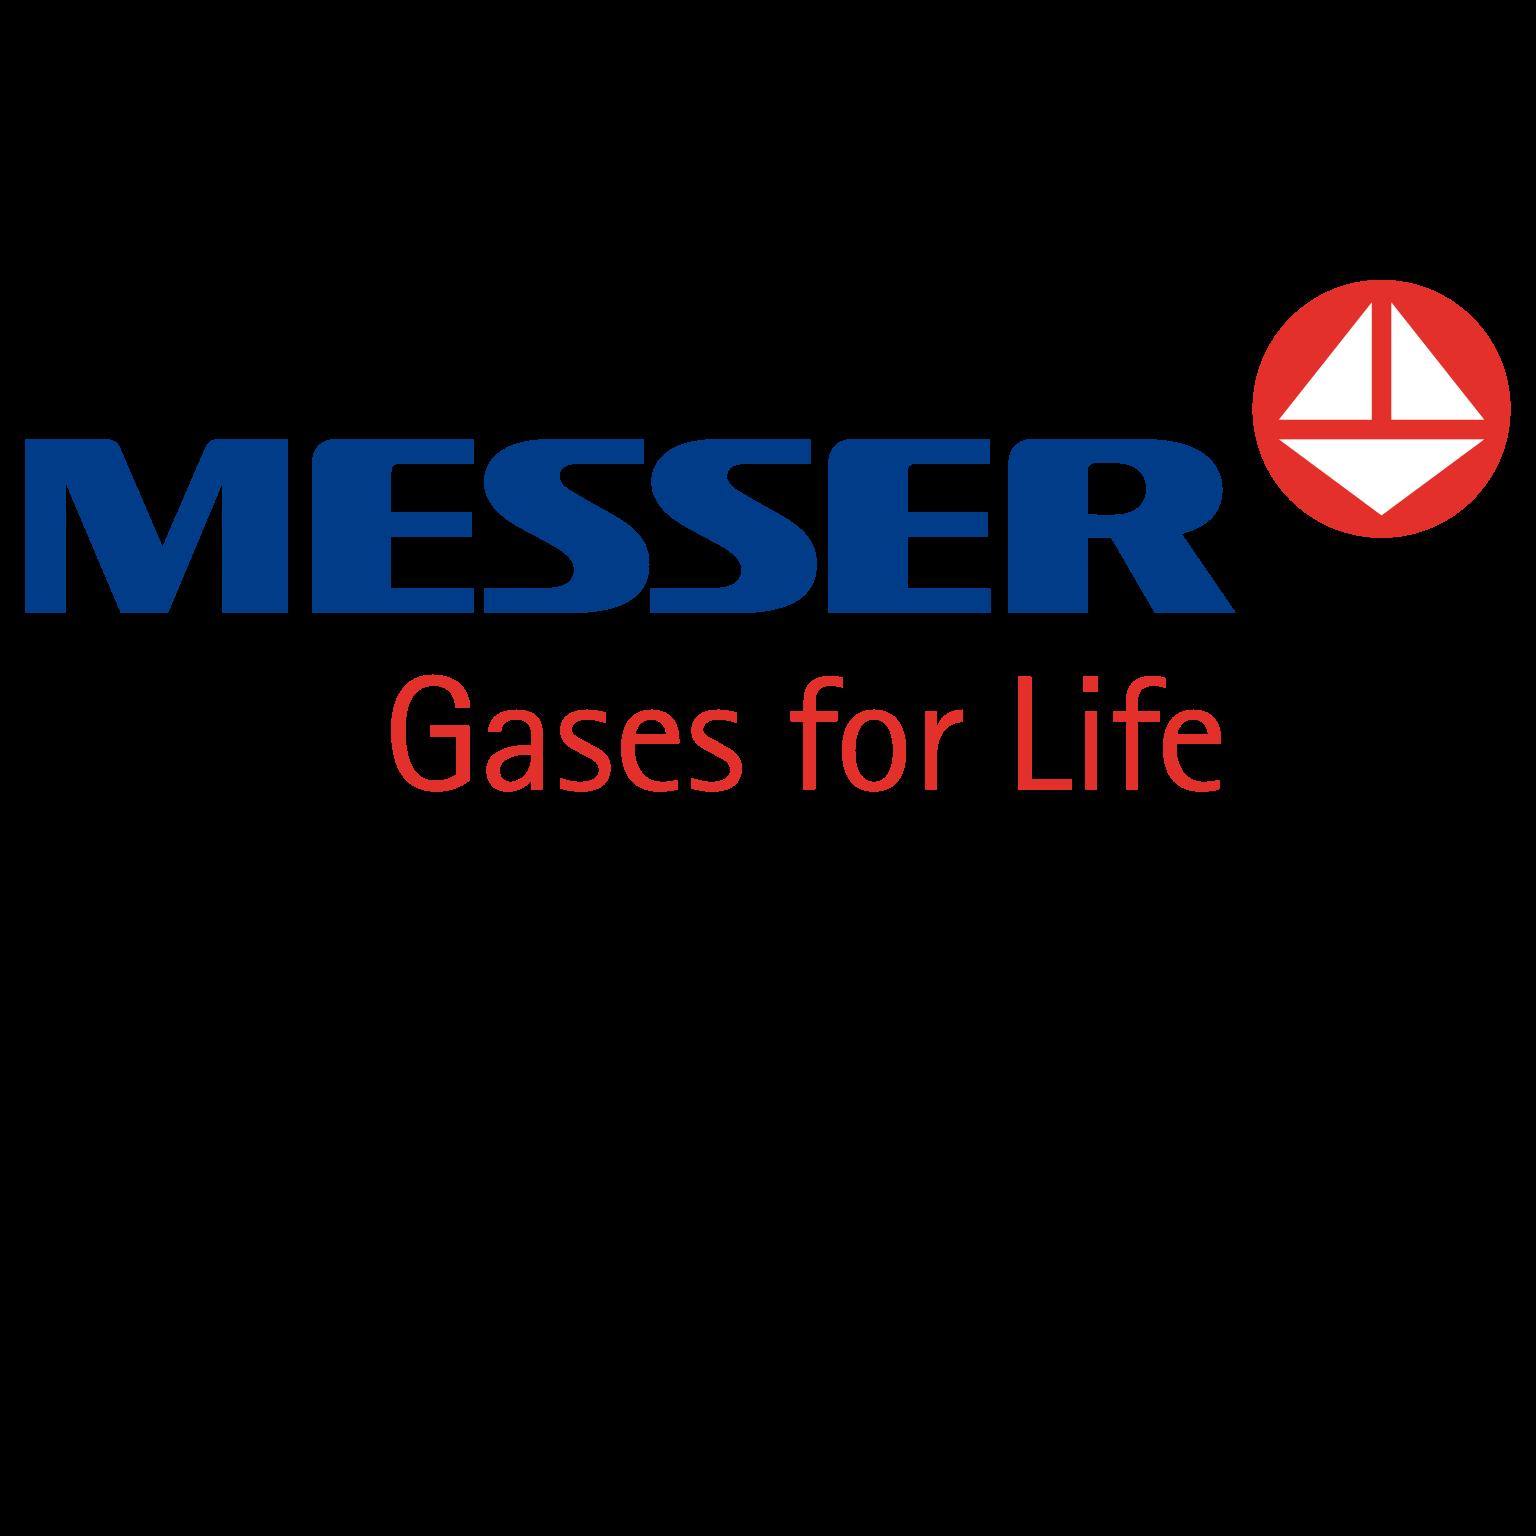 Messer-Logo-wg-Bug